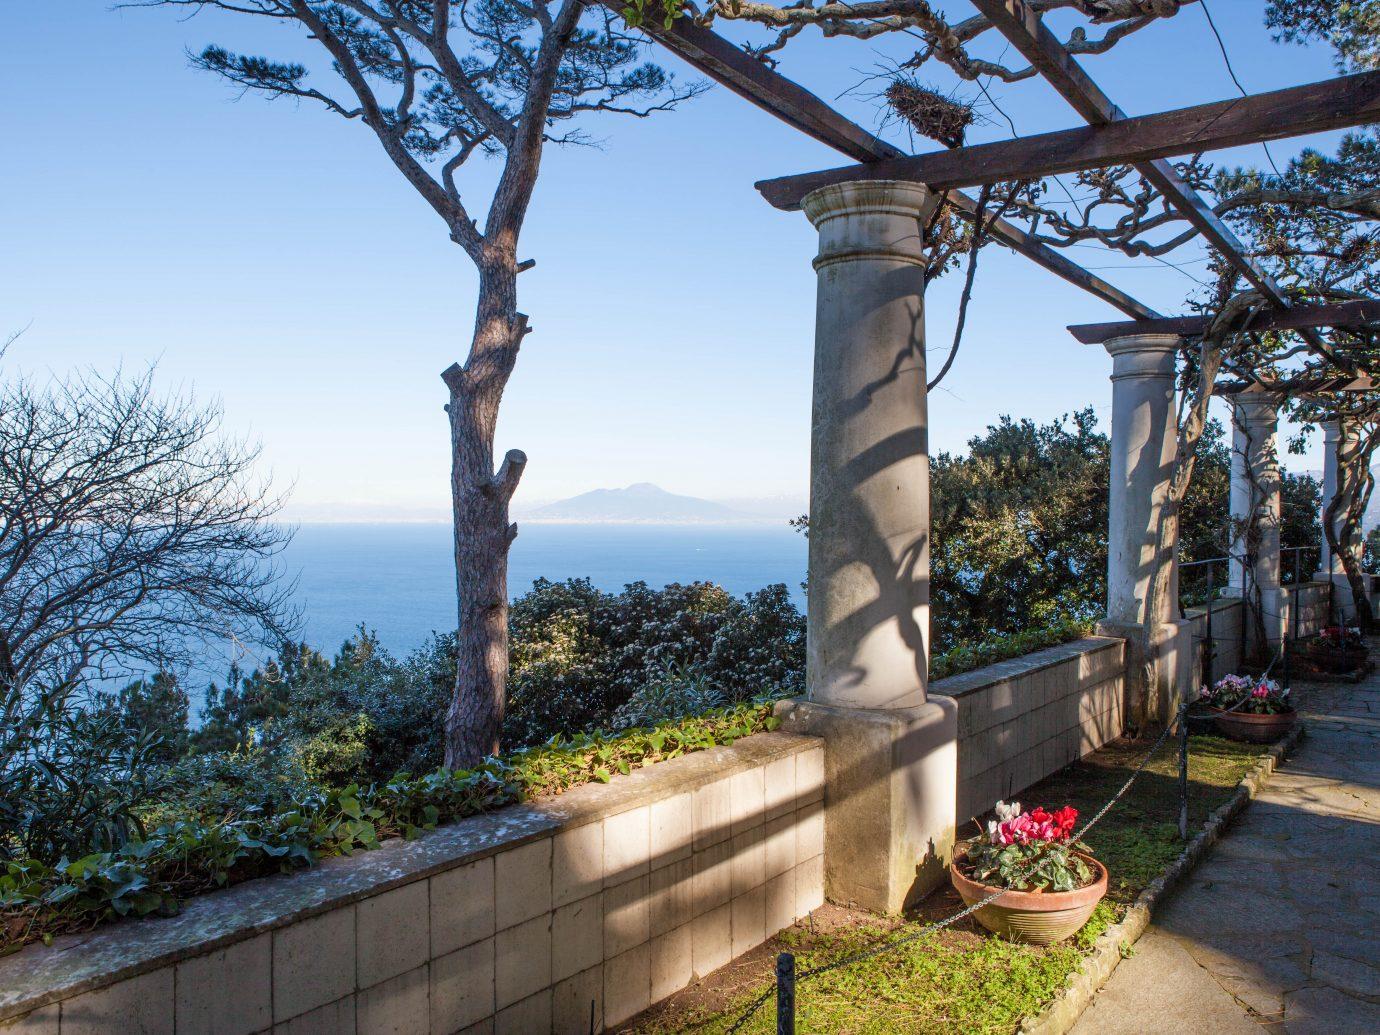 """Beautiful patio in Villa San Michele, Capri, Naples, Italy.Other similar files:"""